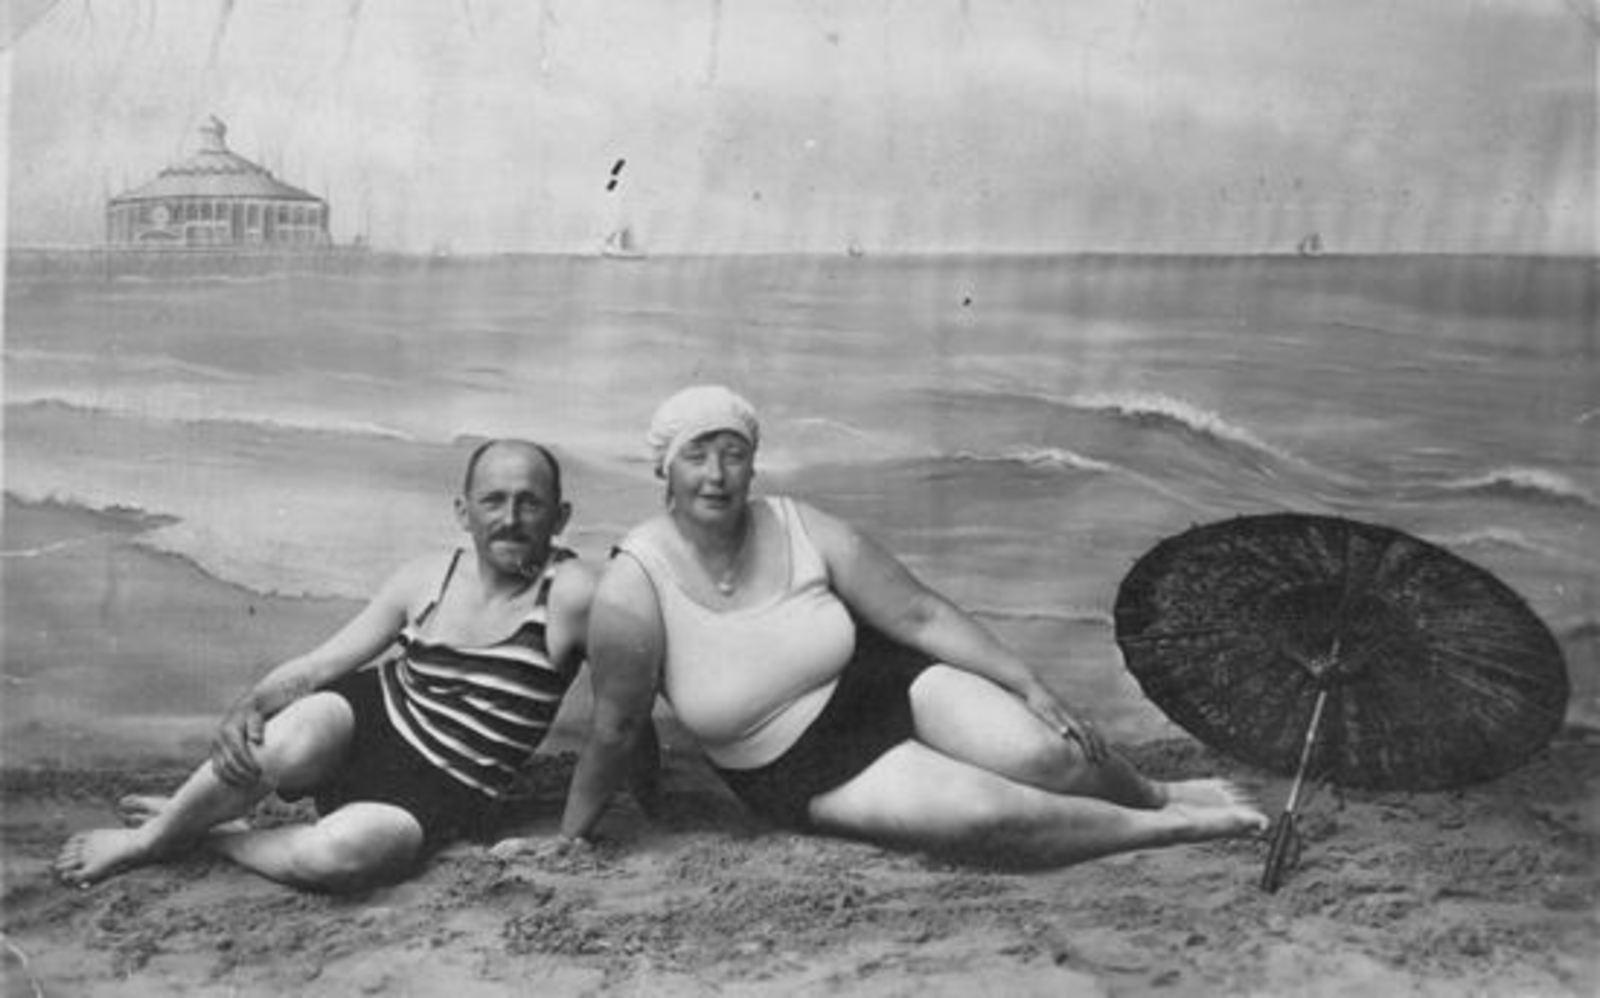 Broere Daniel 1890 19__ met vrouw Jacoba Vlug nep Strandfoto